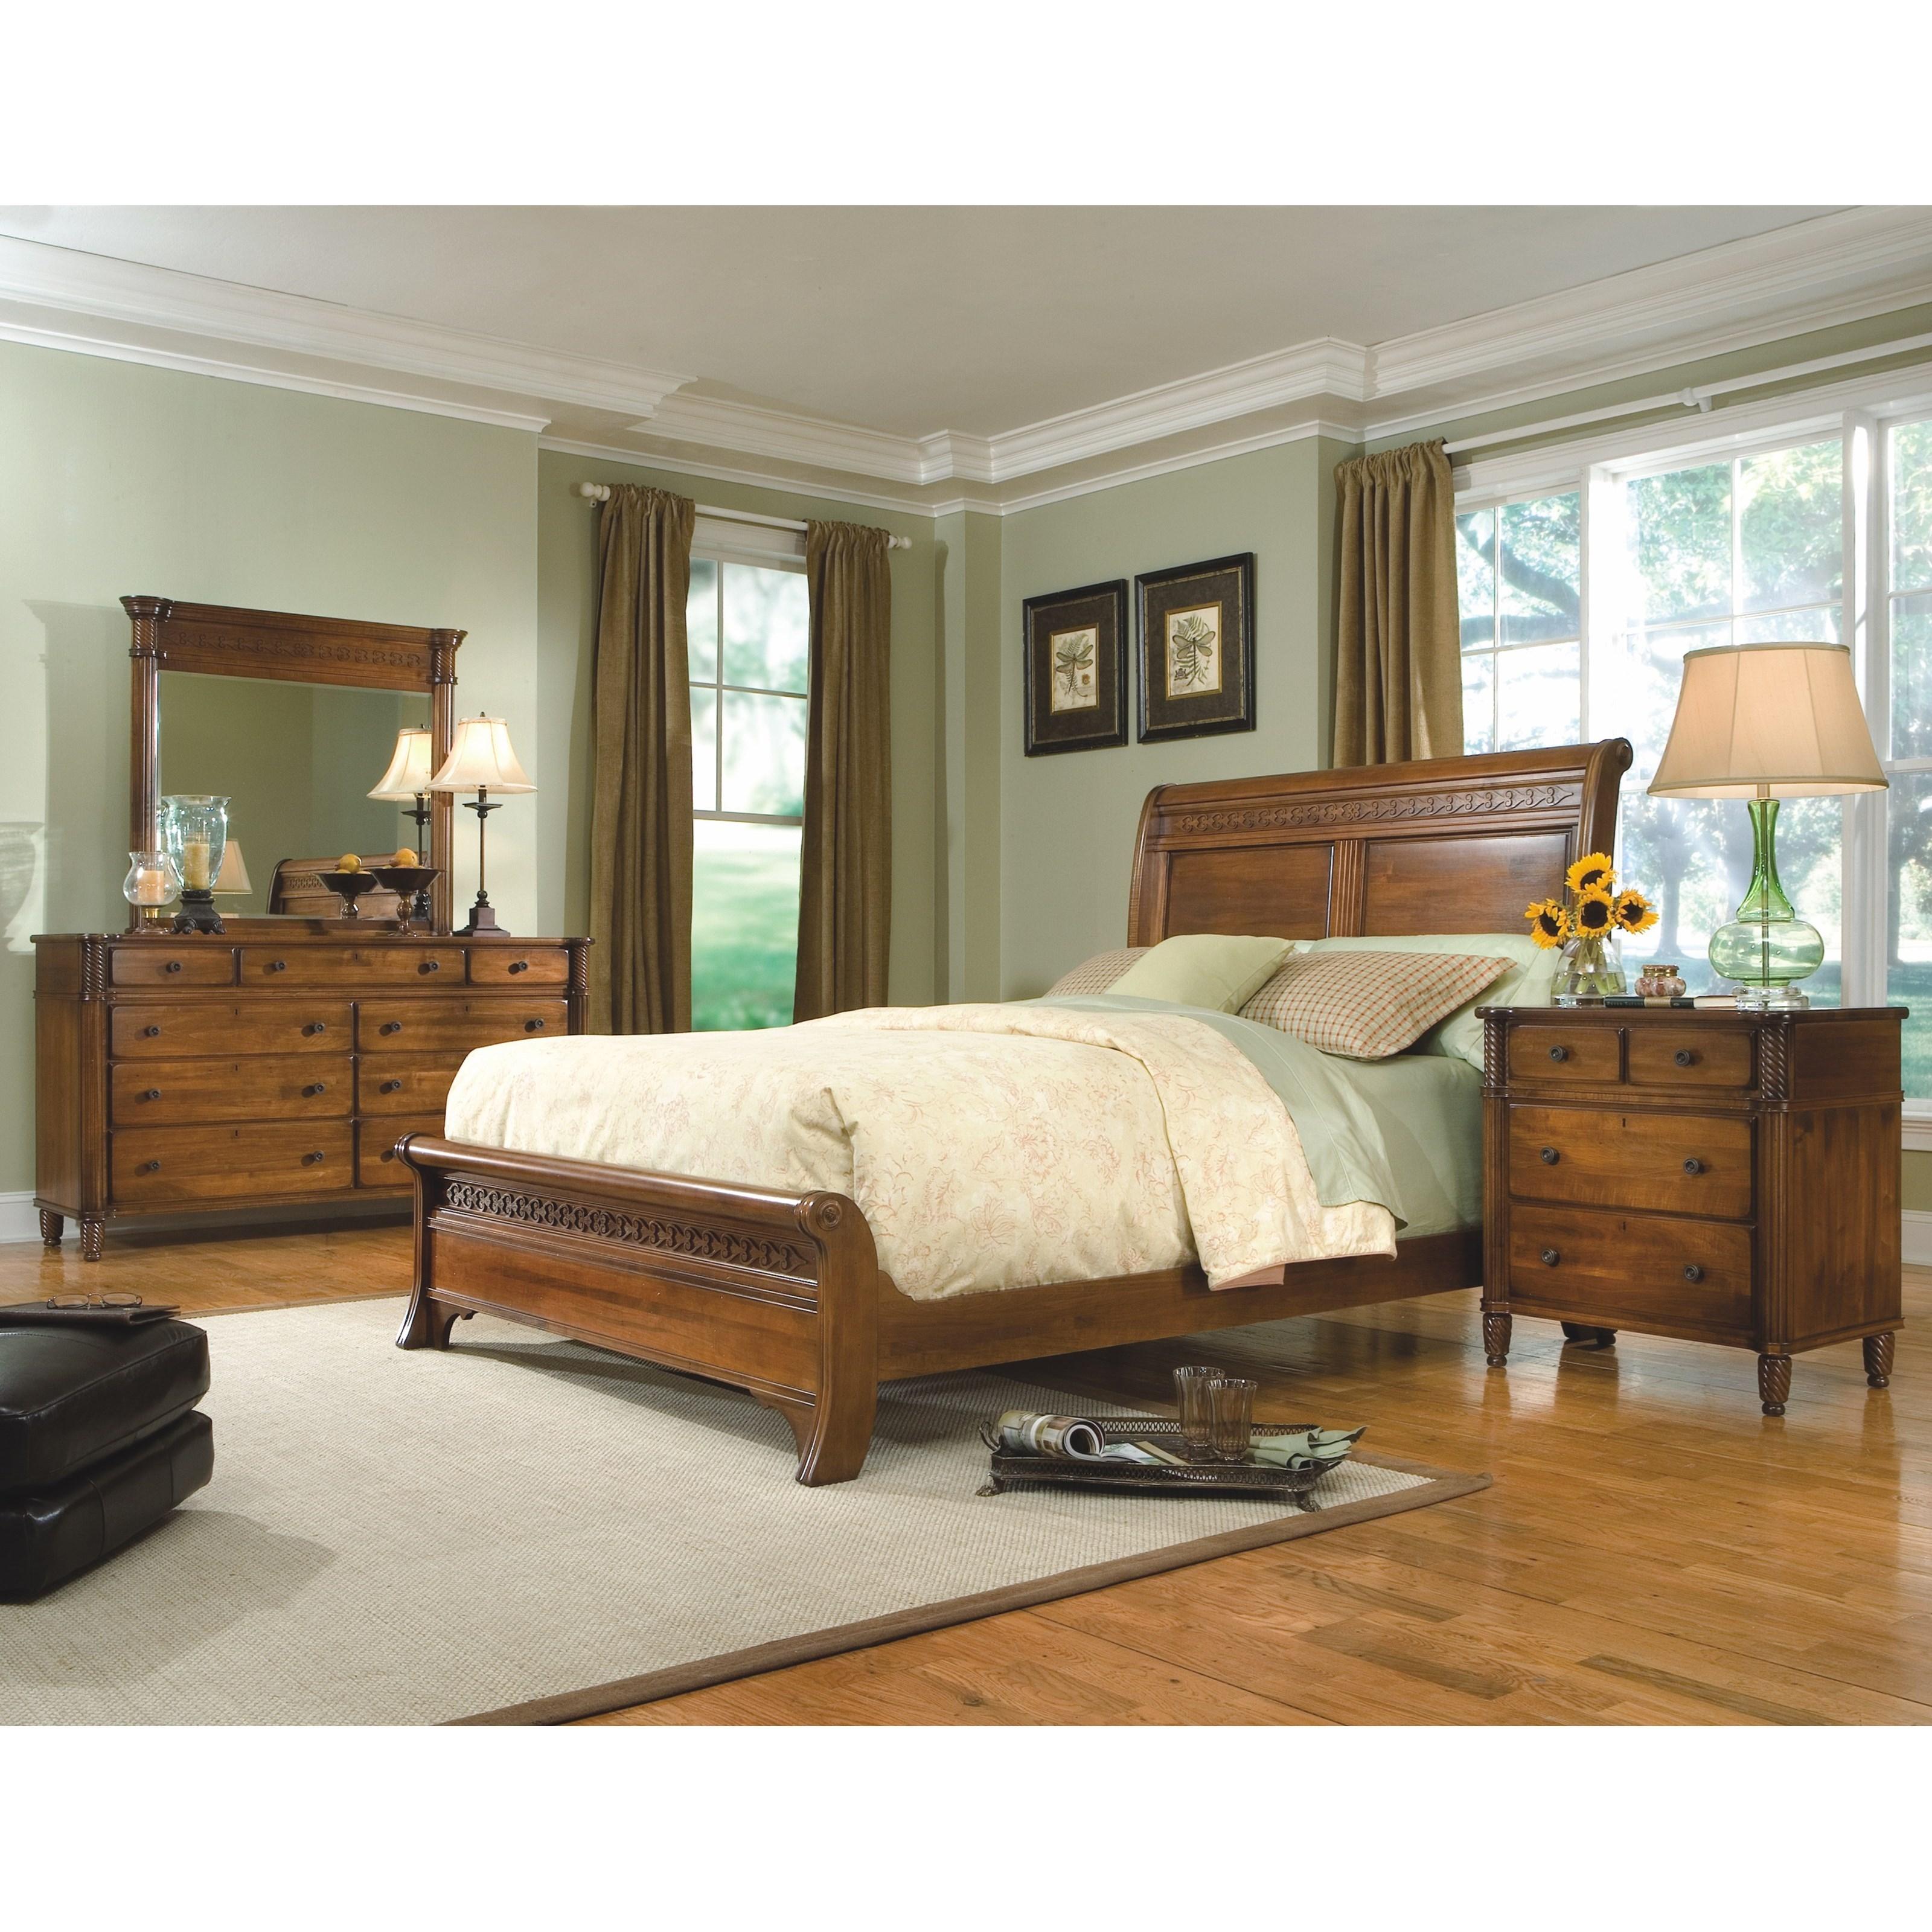 George Washington Architect King Bedroom Group by Durham at Jordan's Home Furnishings